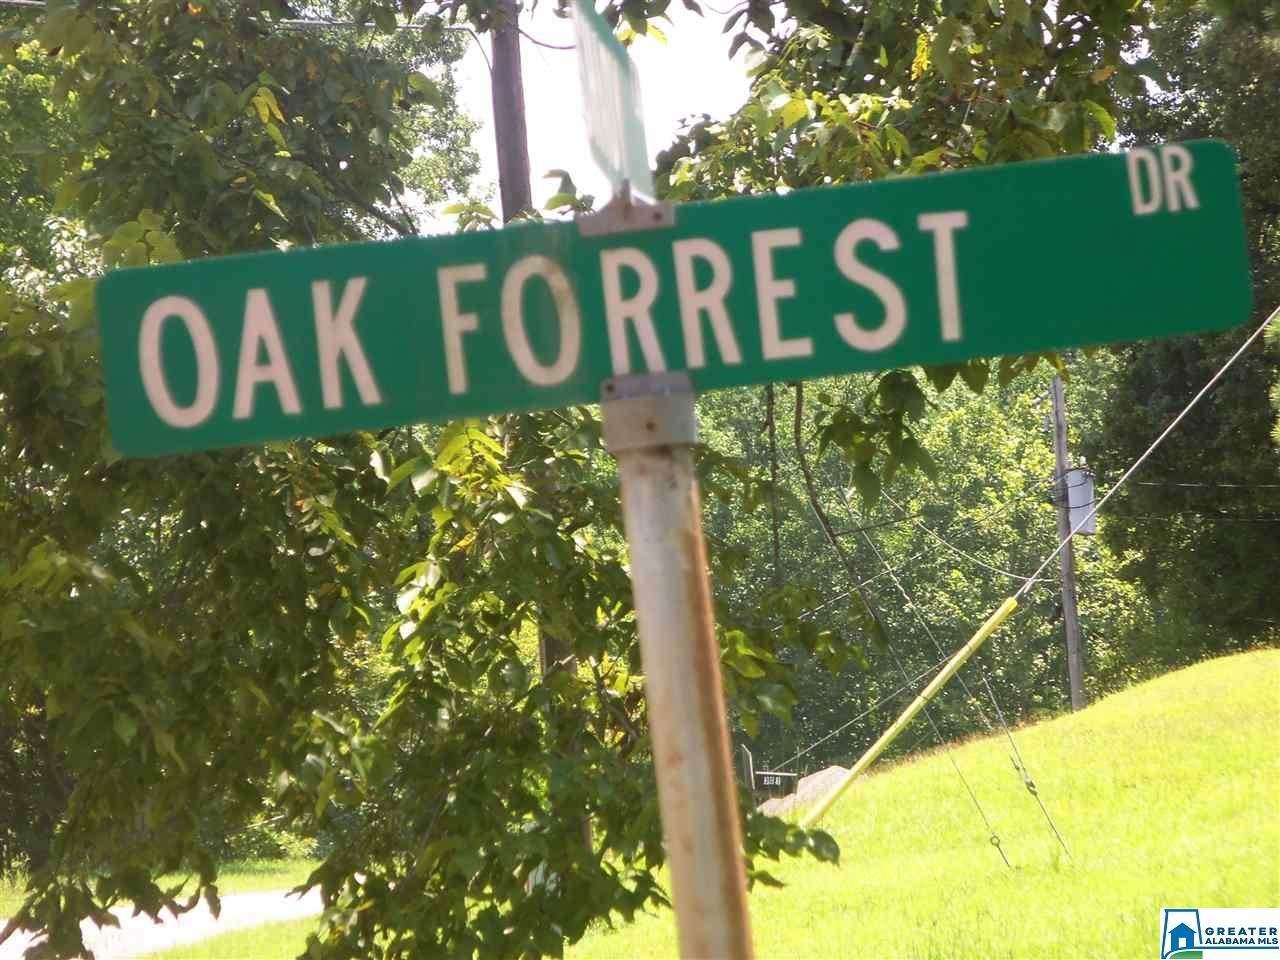 212 Oak Forest Dr - Photo 1